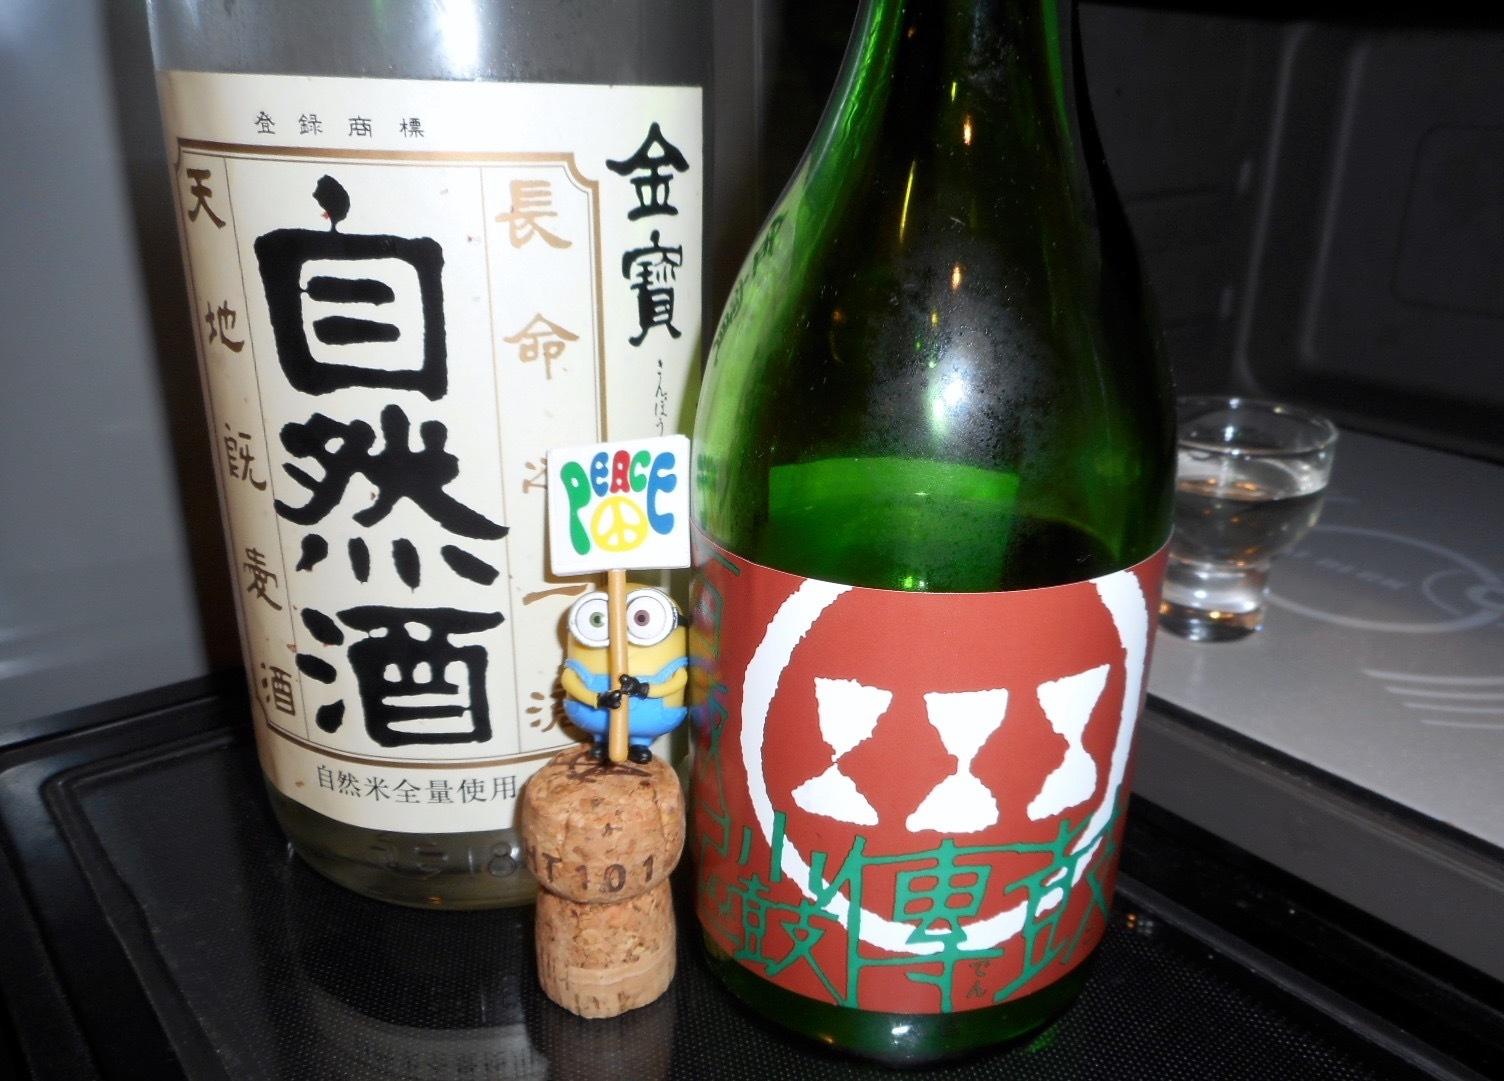 kozutsumi_koden28by7.jpg